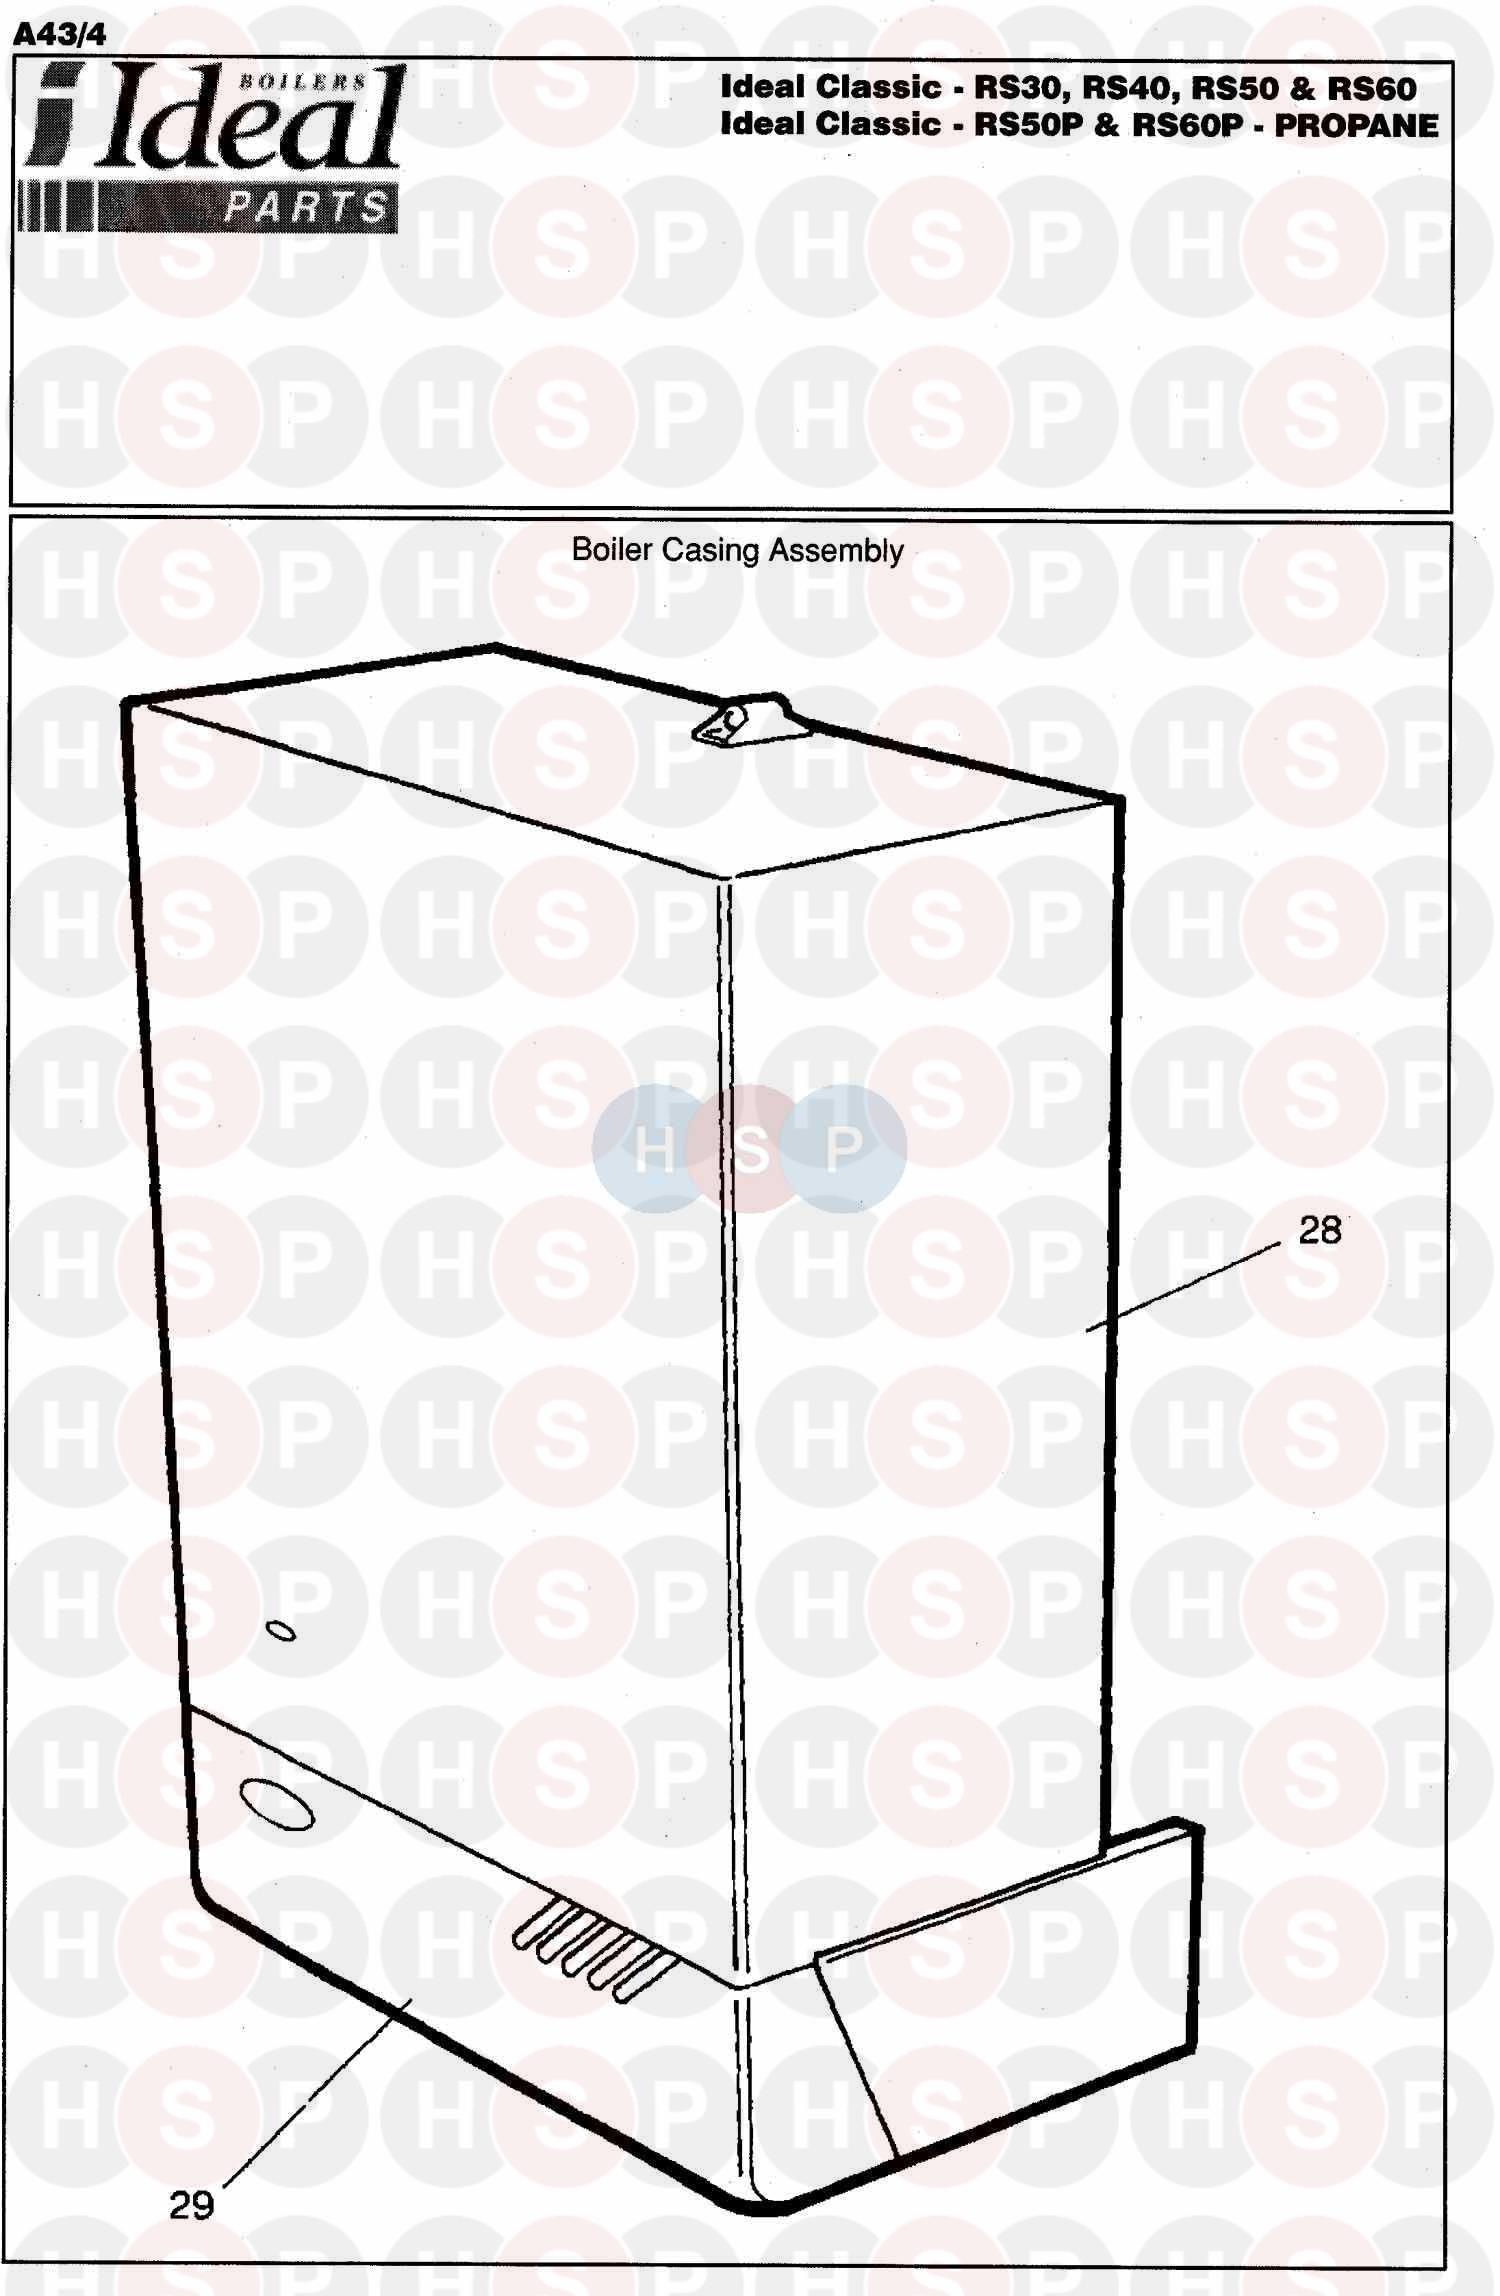 Les Paul Jr Wiring Diagram - Merzie.net